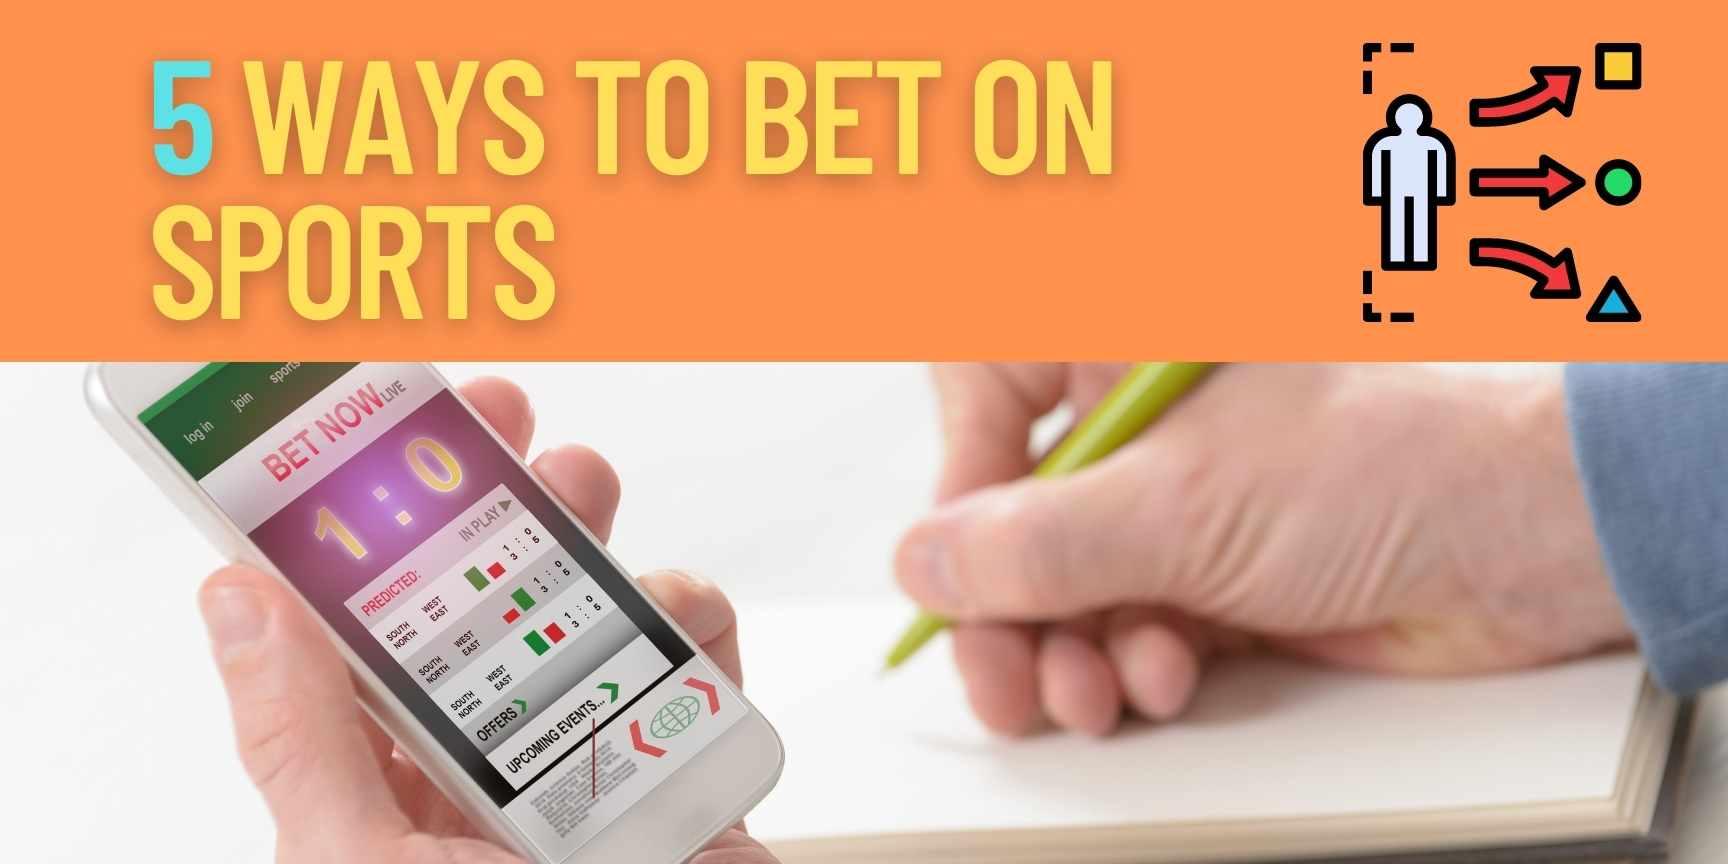 5 ways to bet